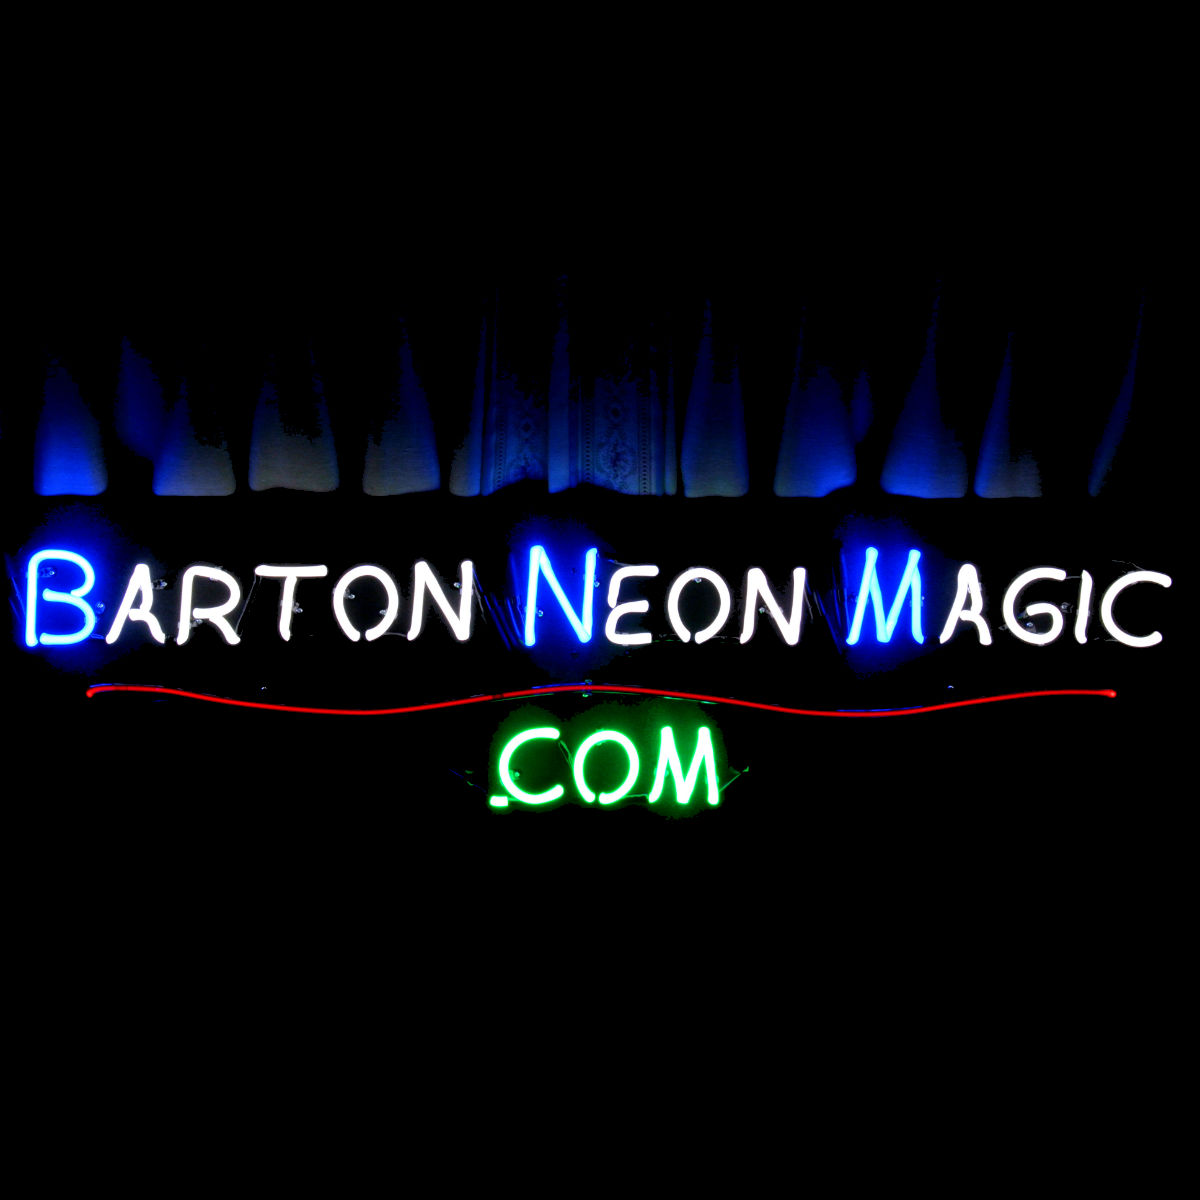 Custom Neon Direct from Famous USA Artist, John Barton - BartonNeonMagic.com